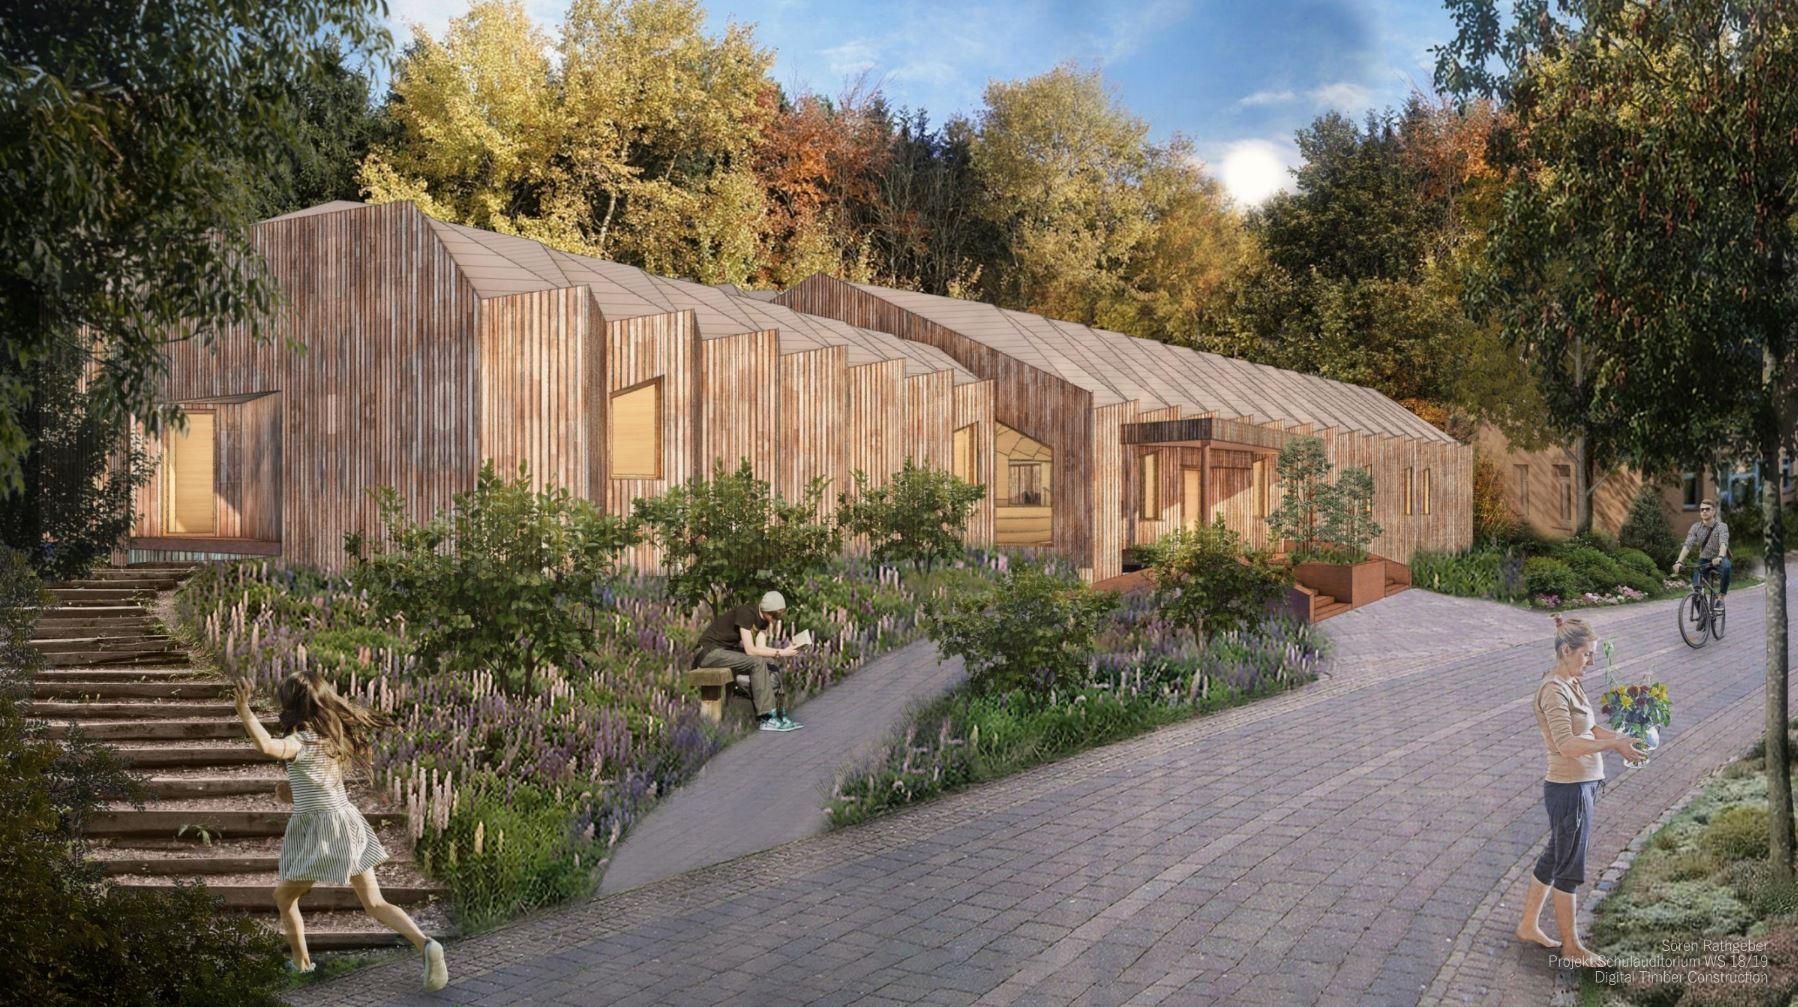 DTC Architecture Studio WS11819, Sören Rathgeber